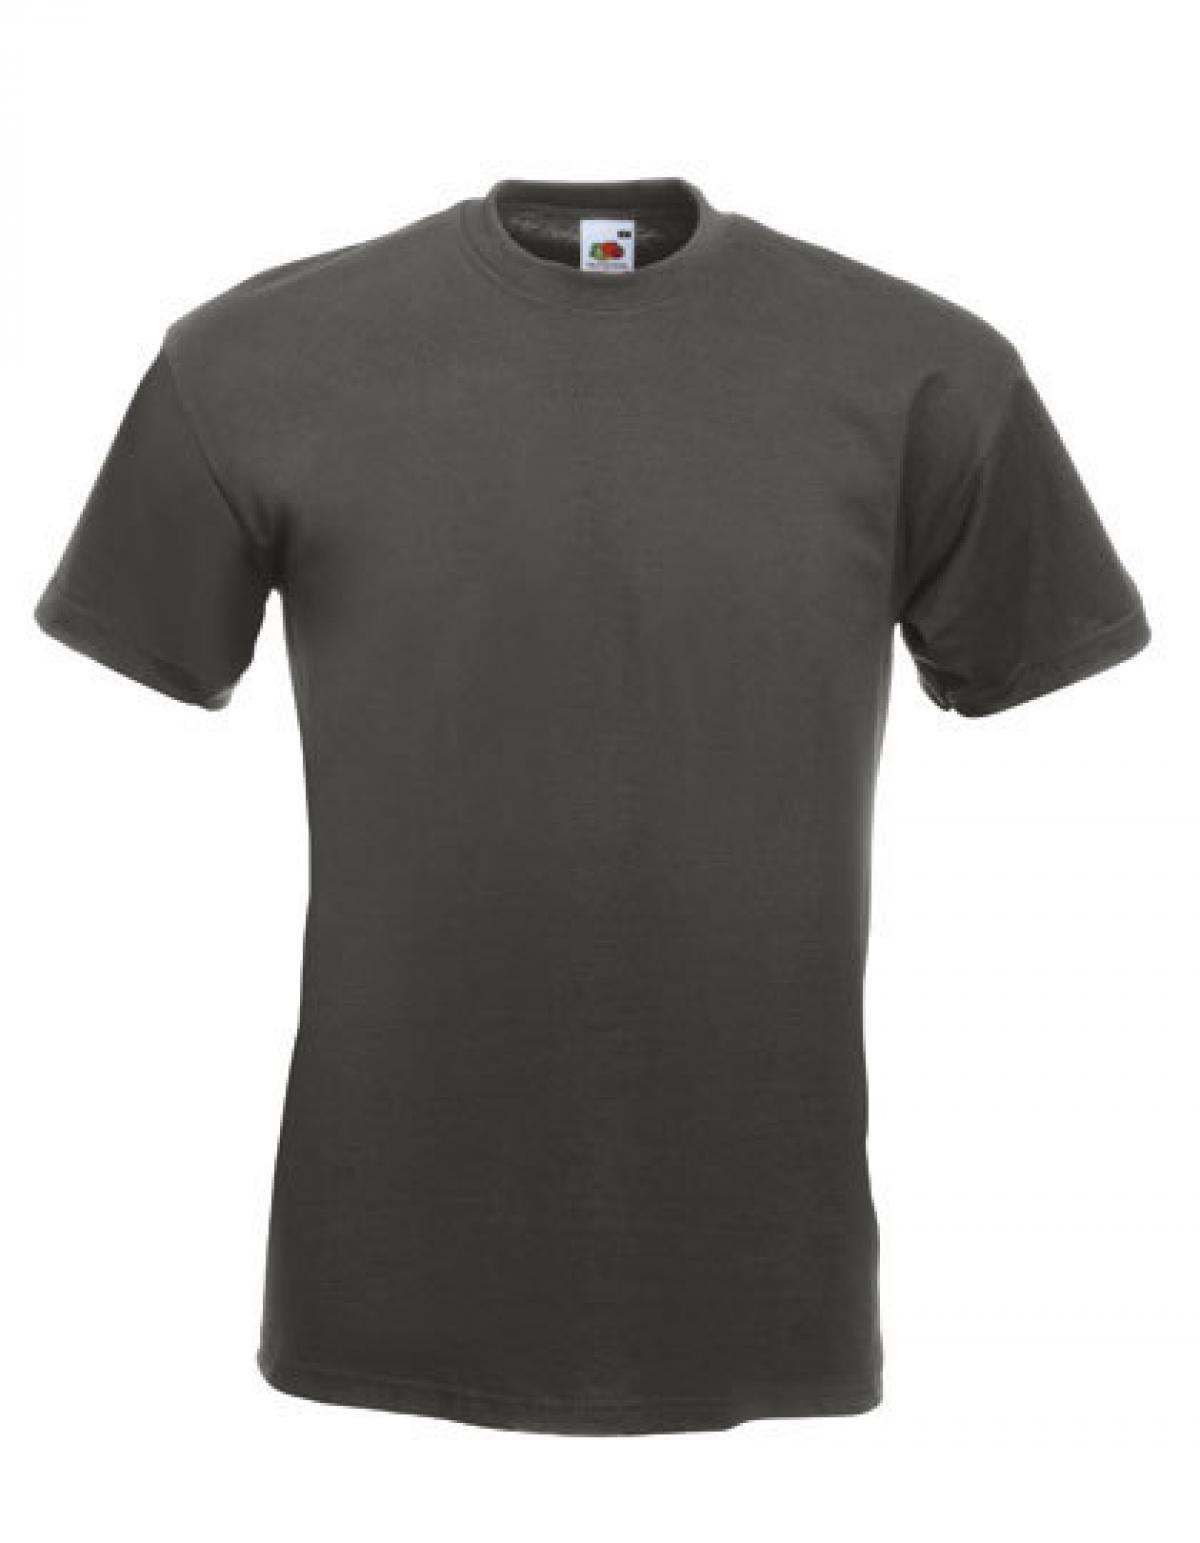 super premium herren t shirt rexlander s. Black Bedroom Furniture Sets. Home Design Ideas